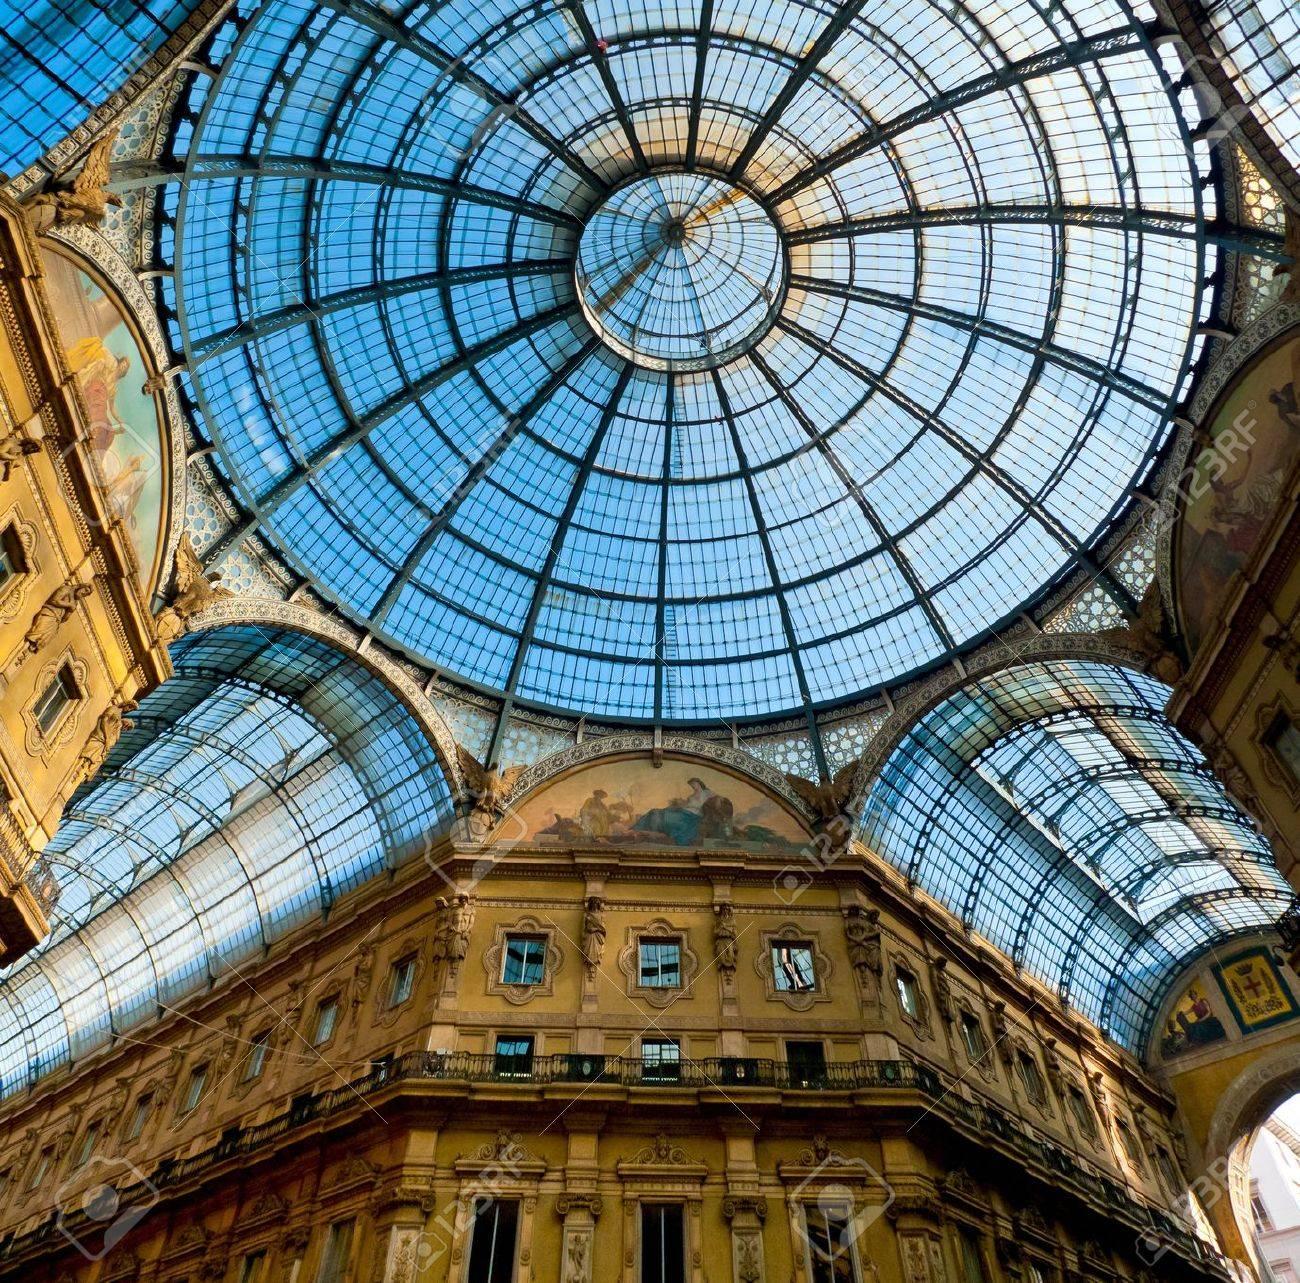 Glass dome of Galleria Vittorio Emanuele in Milan, Italy Standard-Bild - 18080379